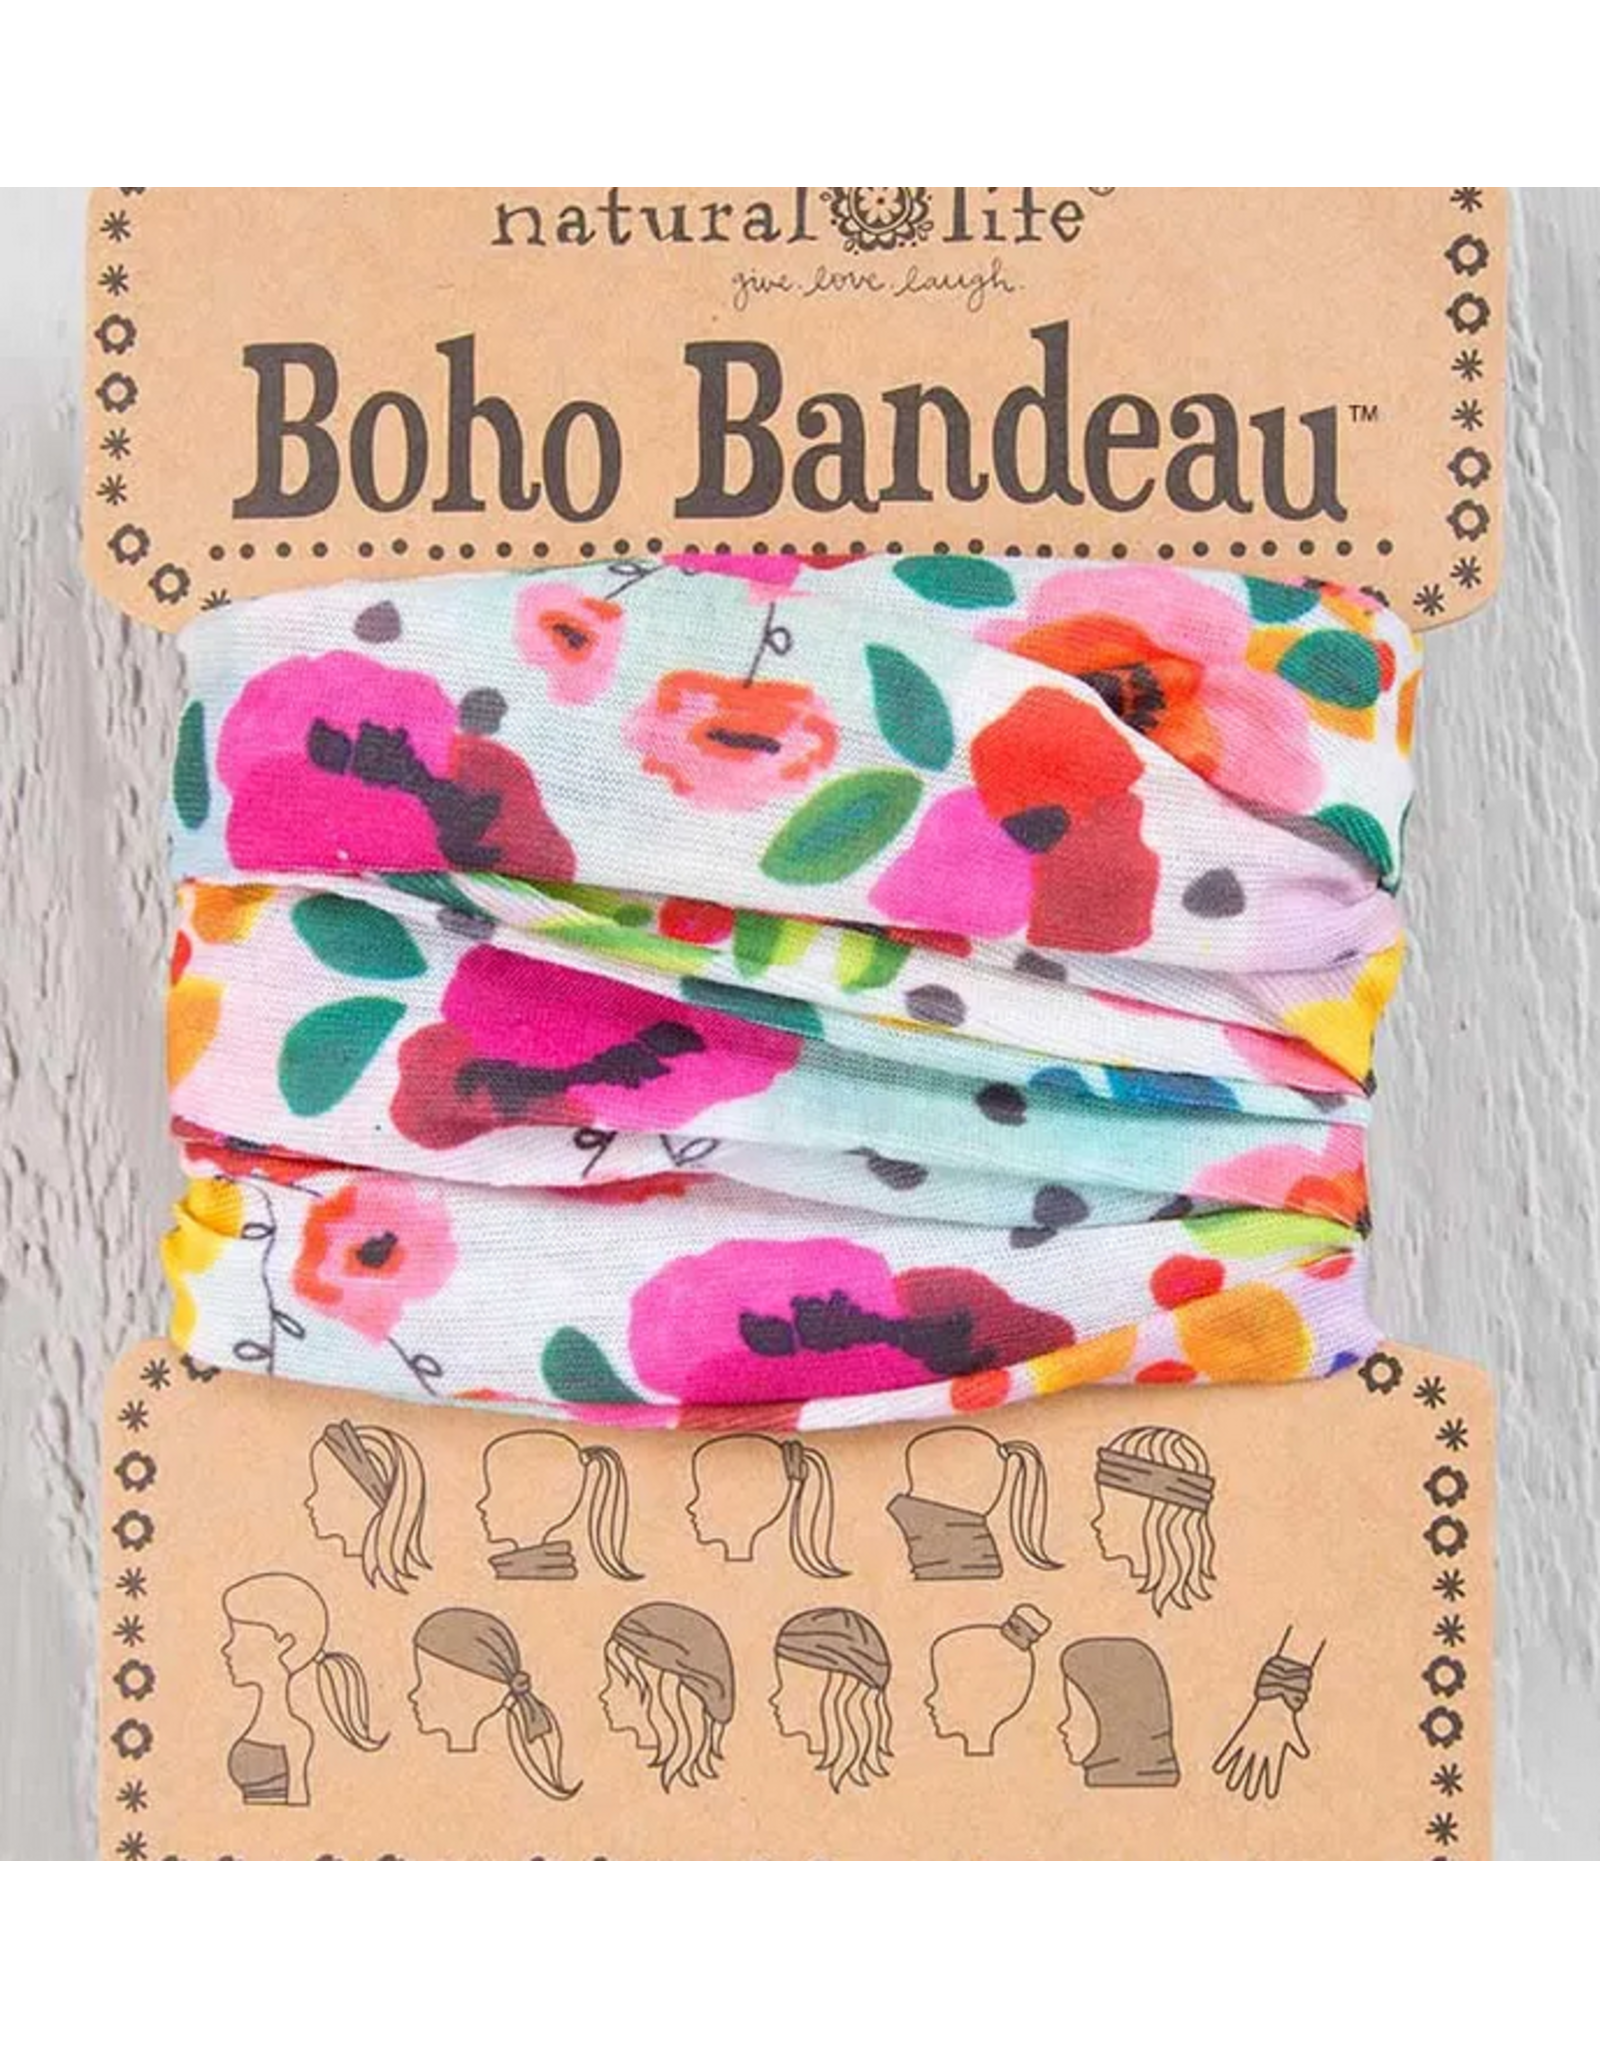 Natural LIfe Boho Bandeau, Pink Floral Polka